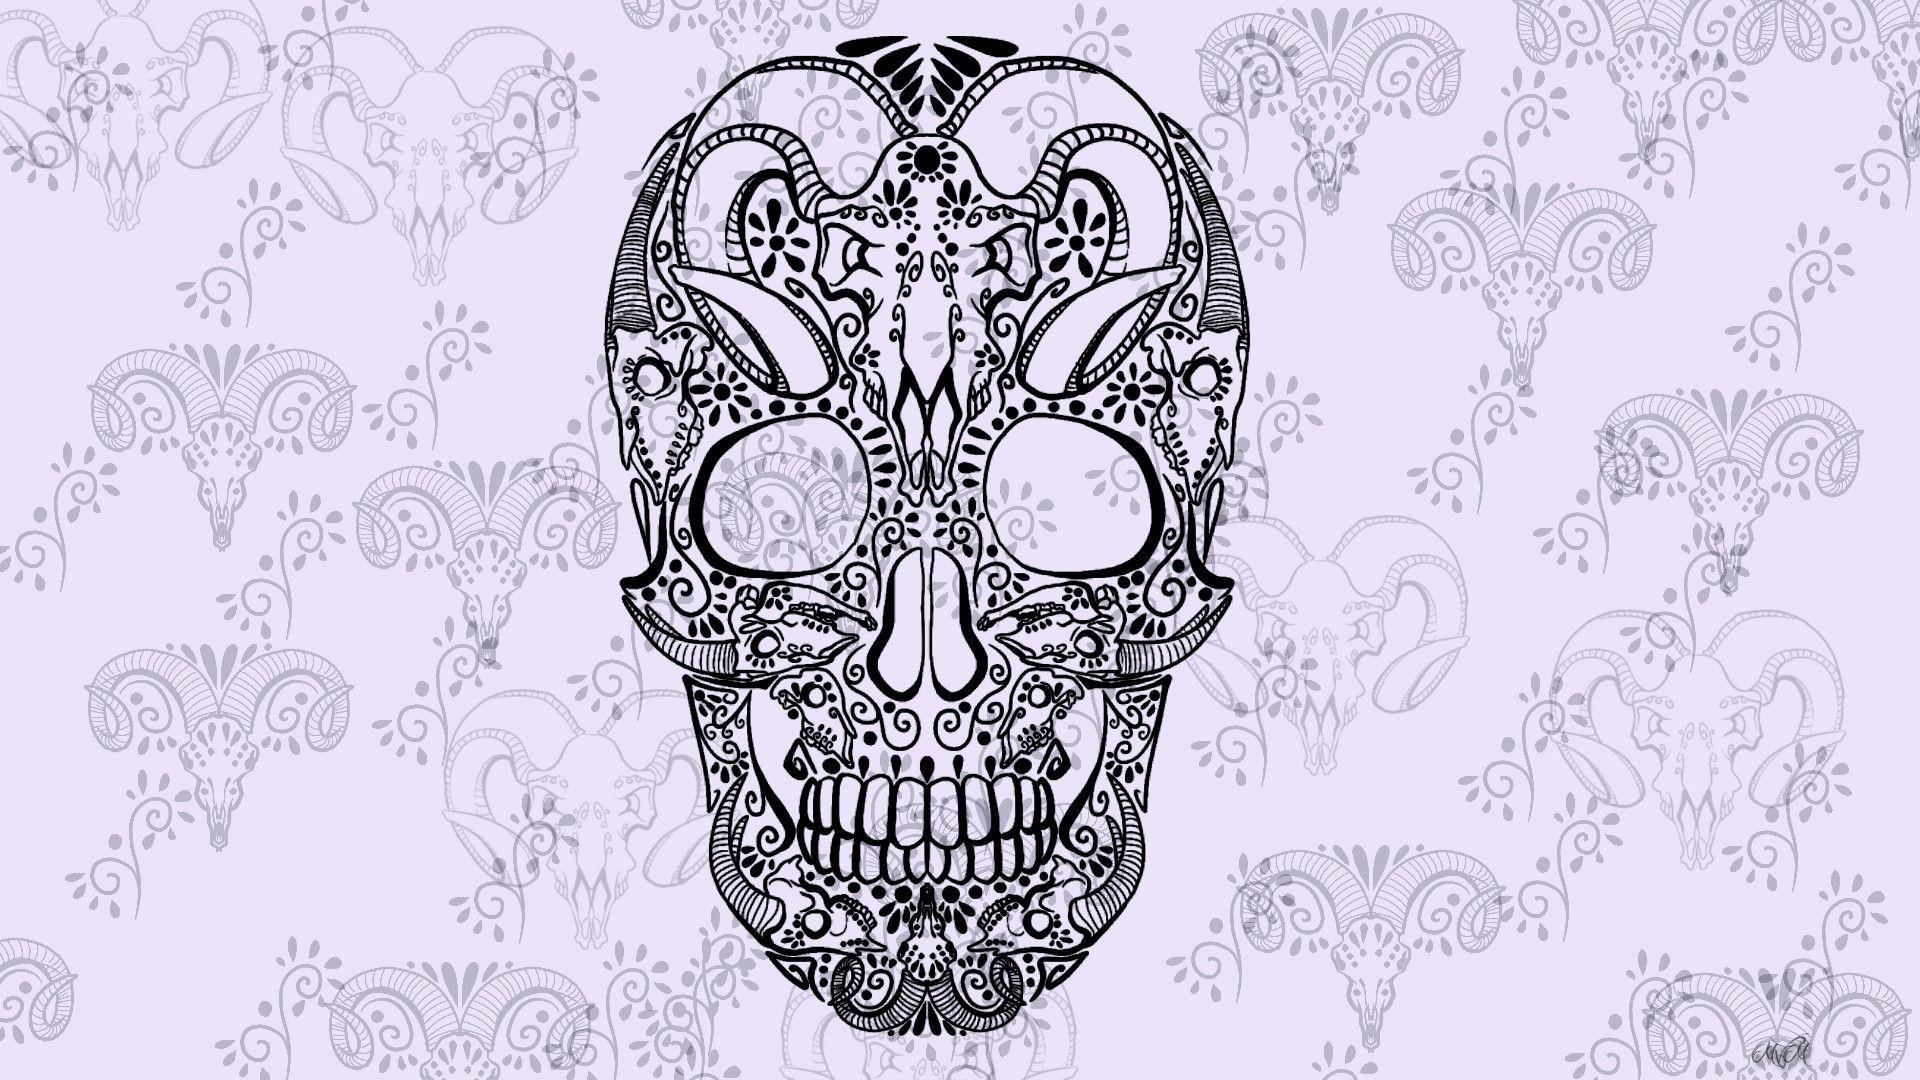 Artwork, Skull, Sugar Skull Wallpapers Hd Desktop And Mobile Backgrounds